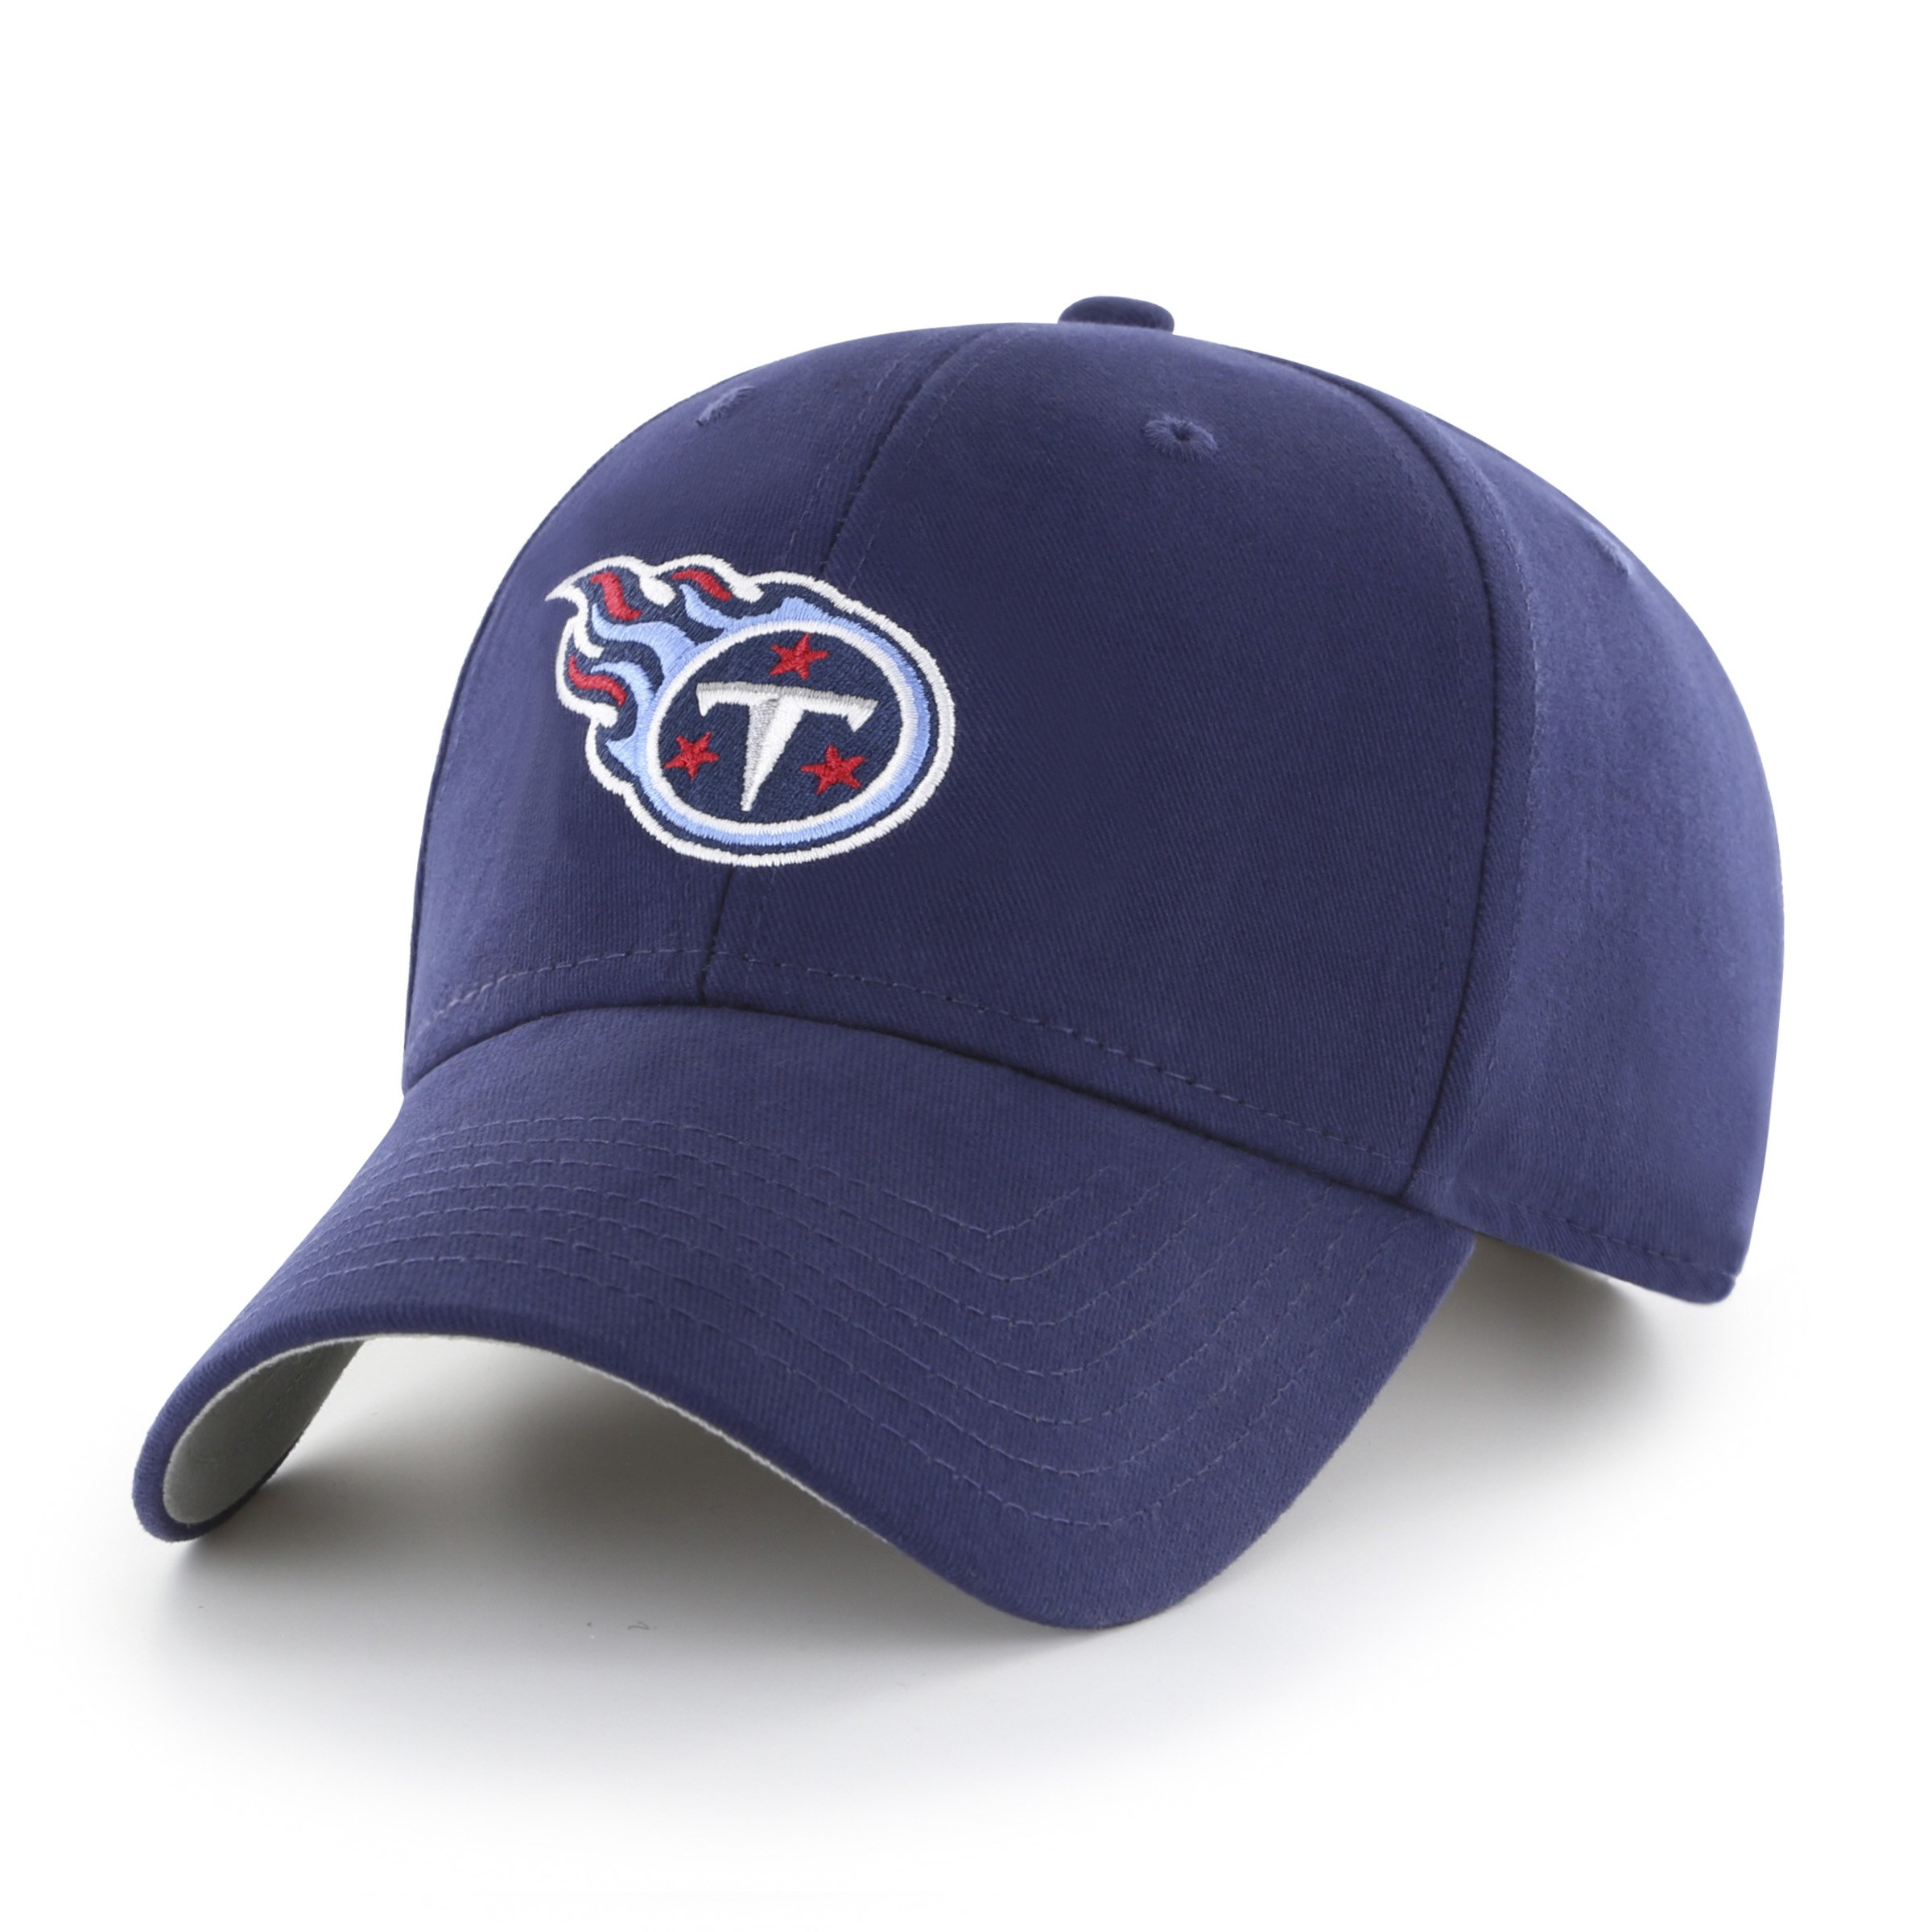 c3dc5d12389b6 Best Rated in Sports Fan Baseball Caps   Helpful Customer Reviews ...